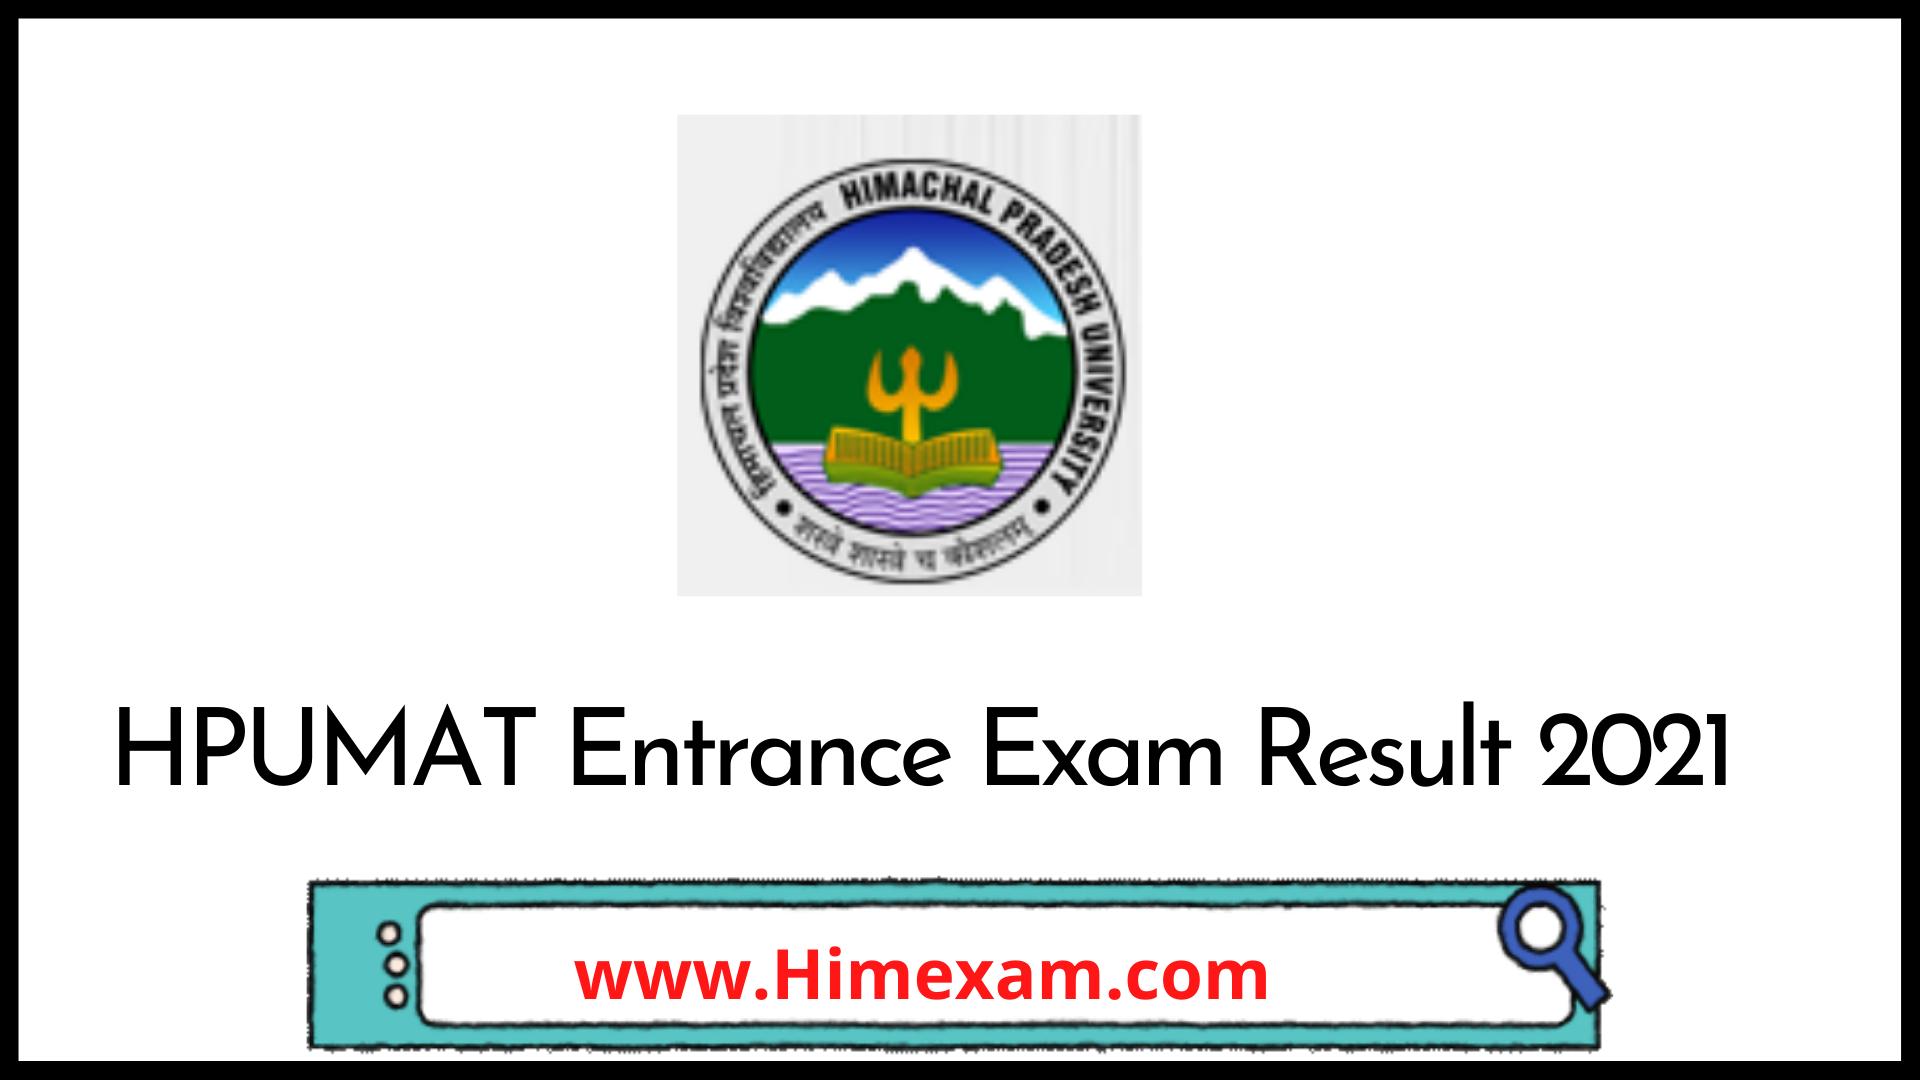 HPUMAT Entrance Exam Result 2021